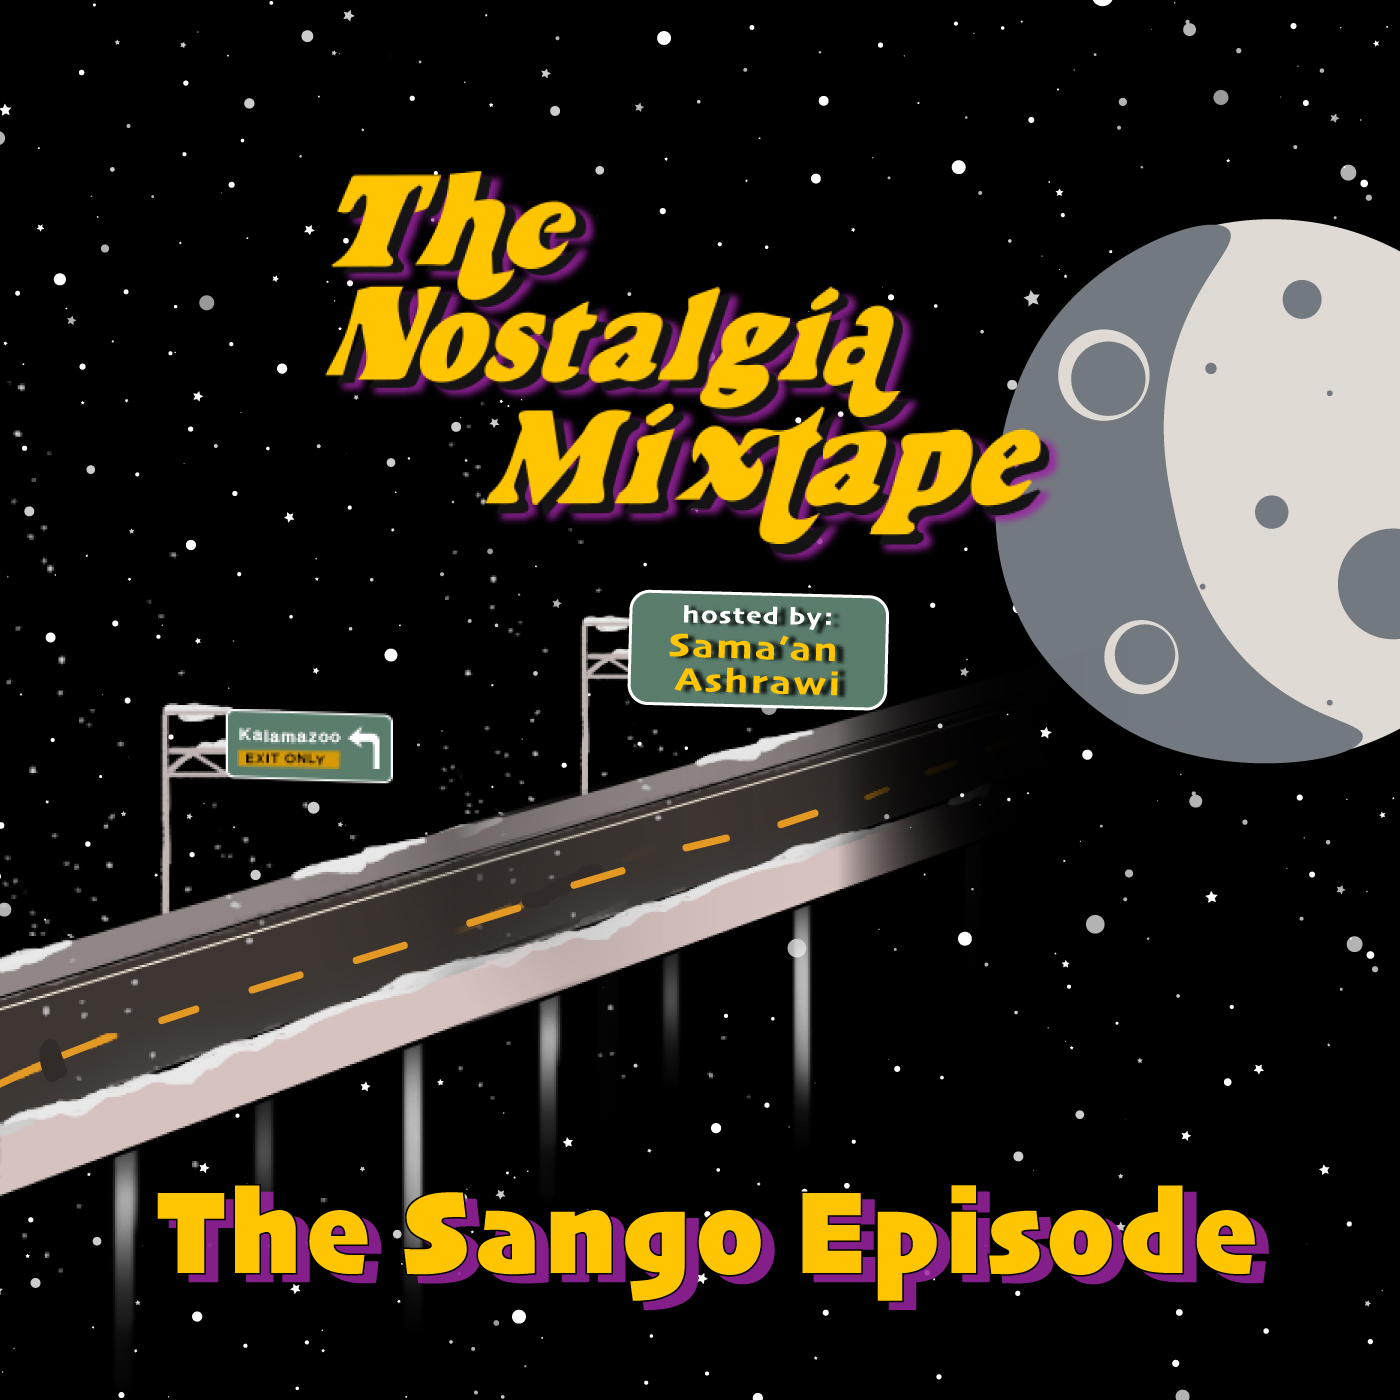 Sango's Nostalgia Mixtape. Hosted by Sama'an Ashrawi.